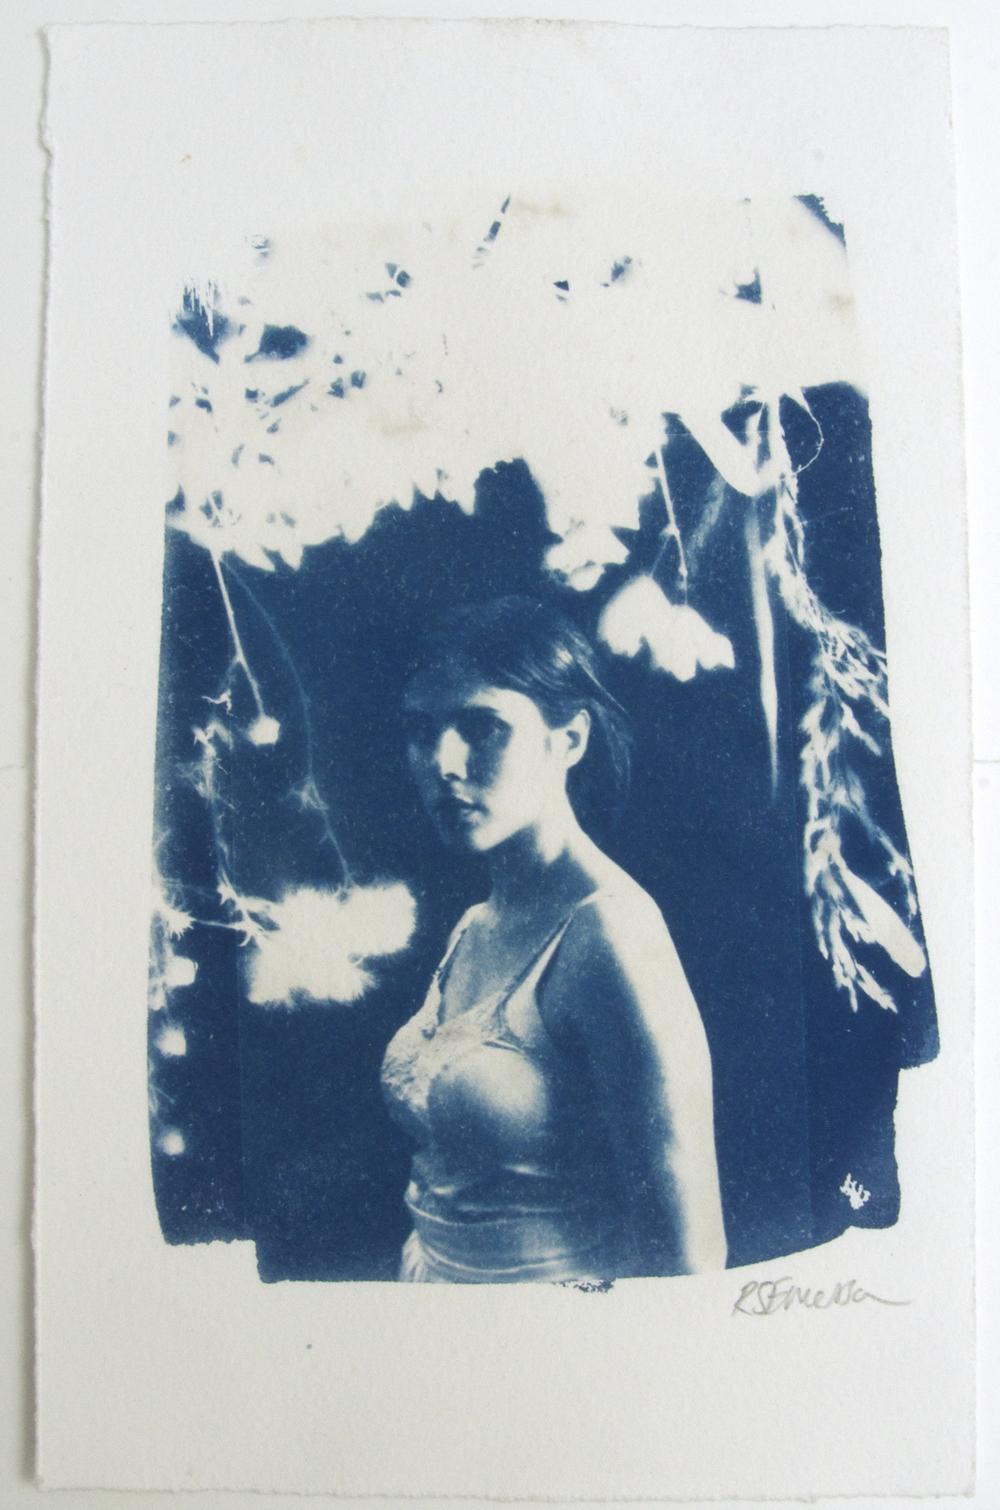 Night Walking  – Original + 2 AP's Cyanotype on paper, framed Artwork: 16.6 x 26.8 cm (34 x 48 cm framed) 2015